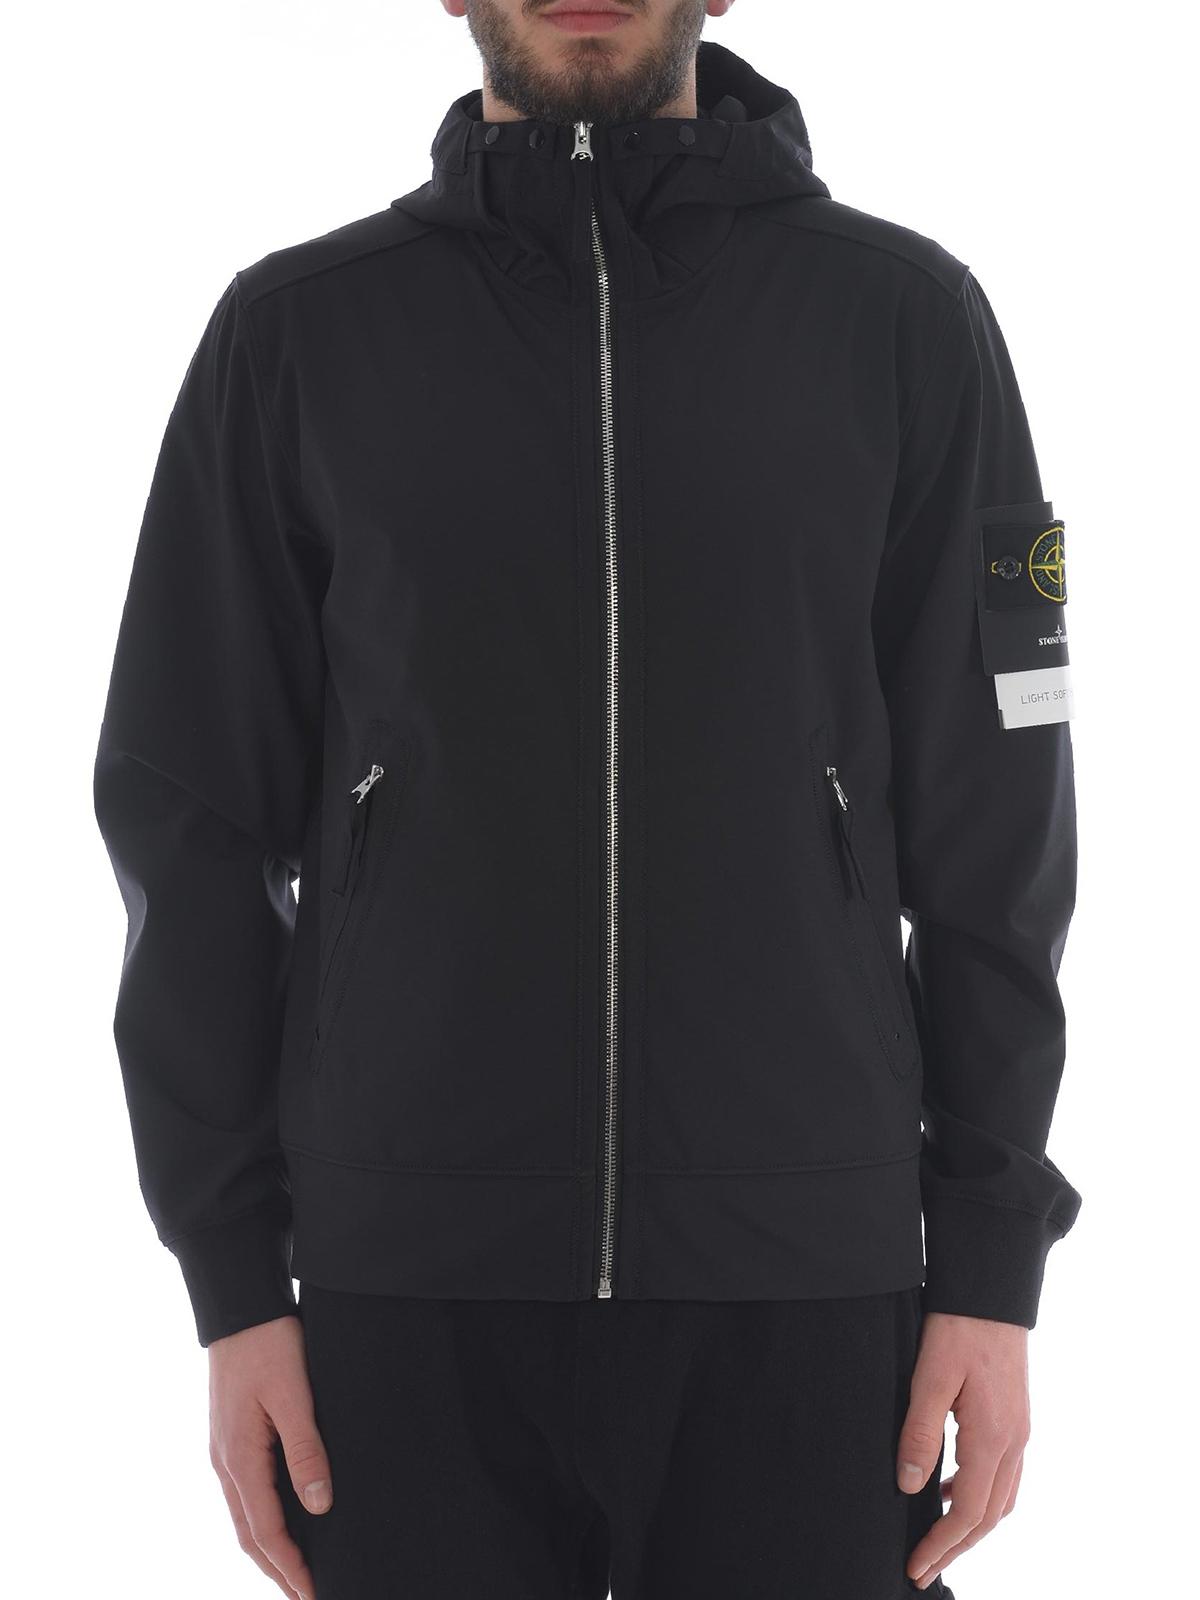 Light Soft Shell-R Black Jacket